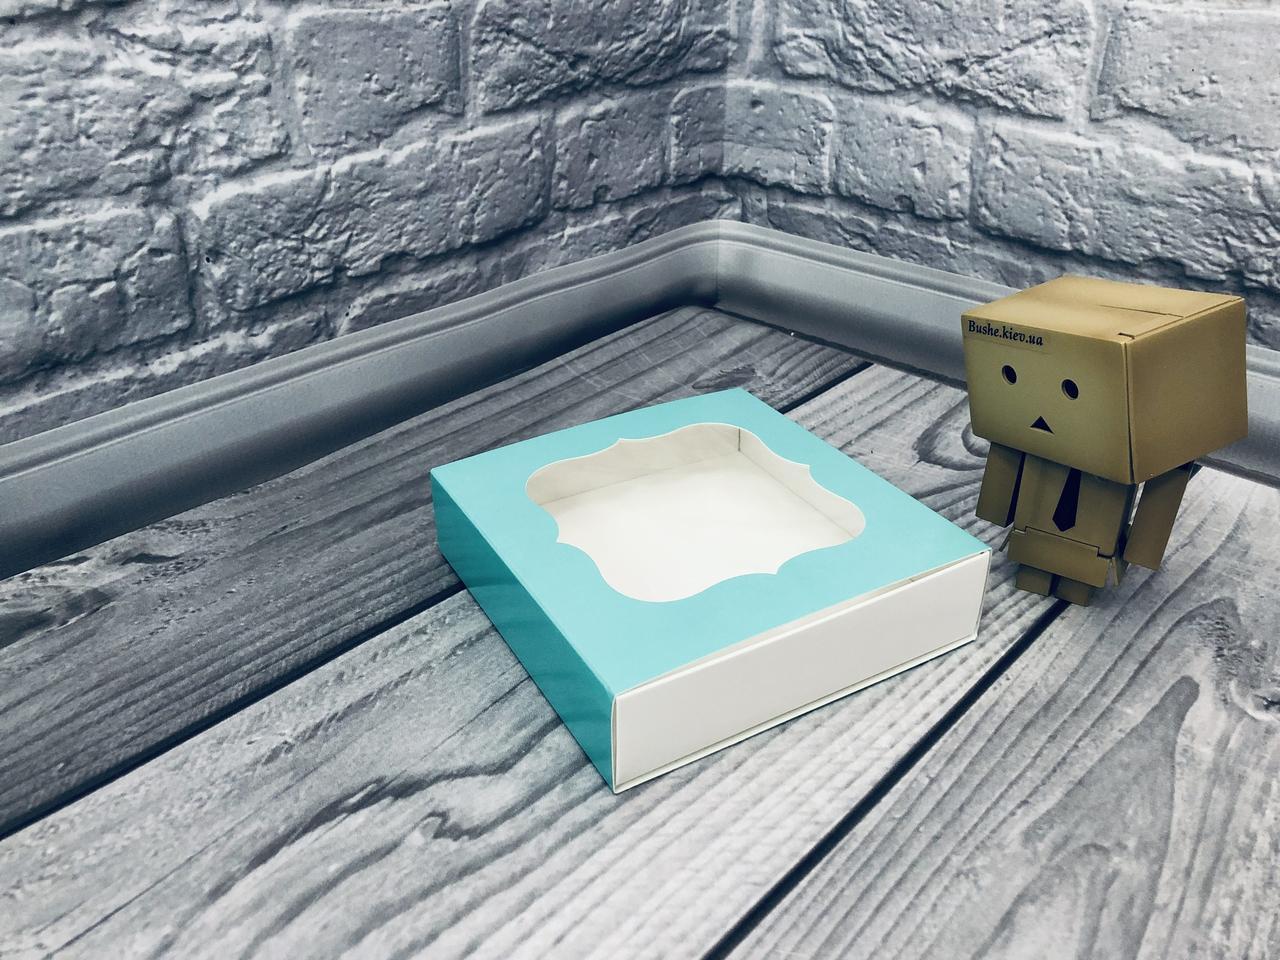 *50 шт* / Коробка для пряников / 120х120х30 мм / печать-Бирюз / окно-обычн